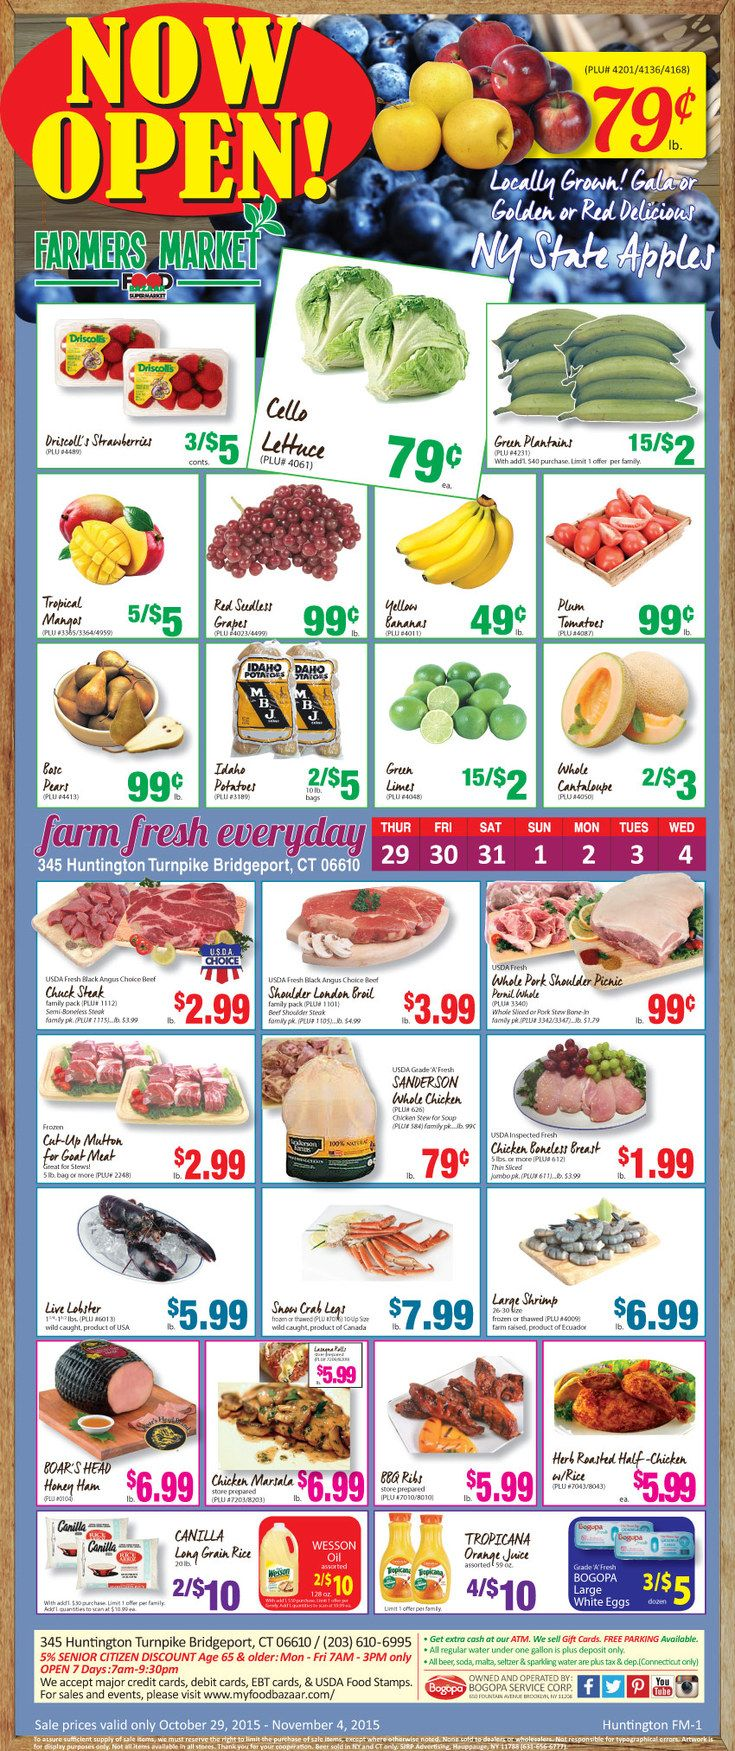 Food bazaar circular october 22 28 2015 weekly ads